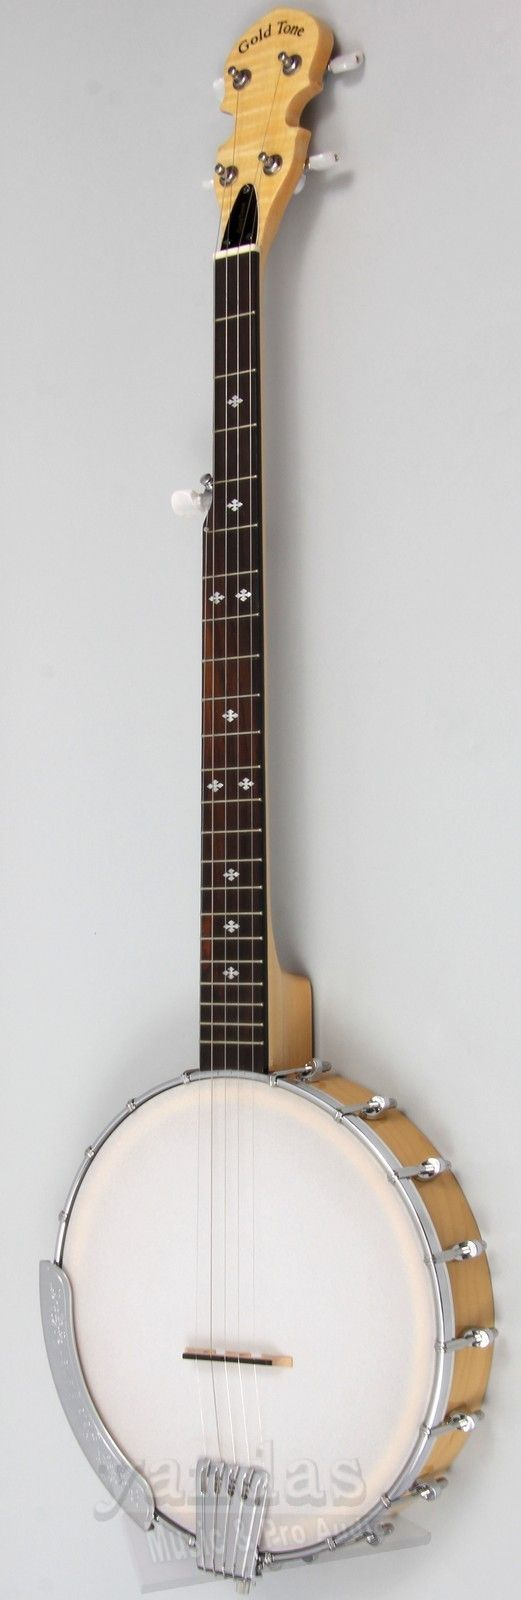 Gold Tone CC-100 Cripple Creek 5-String Open Back Banjo